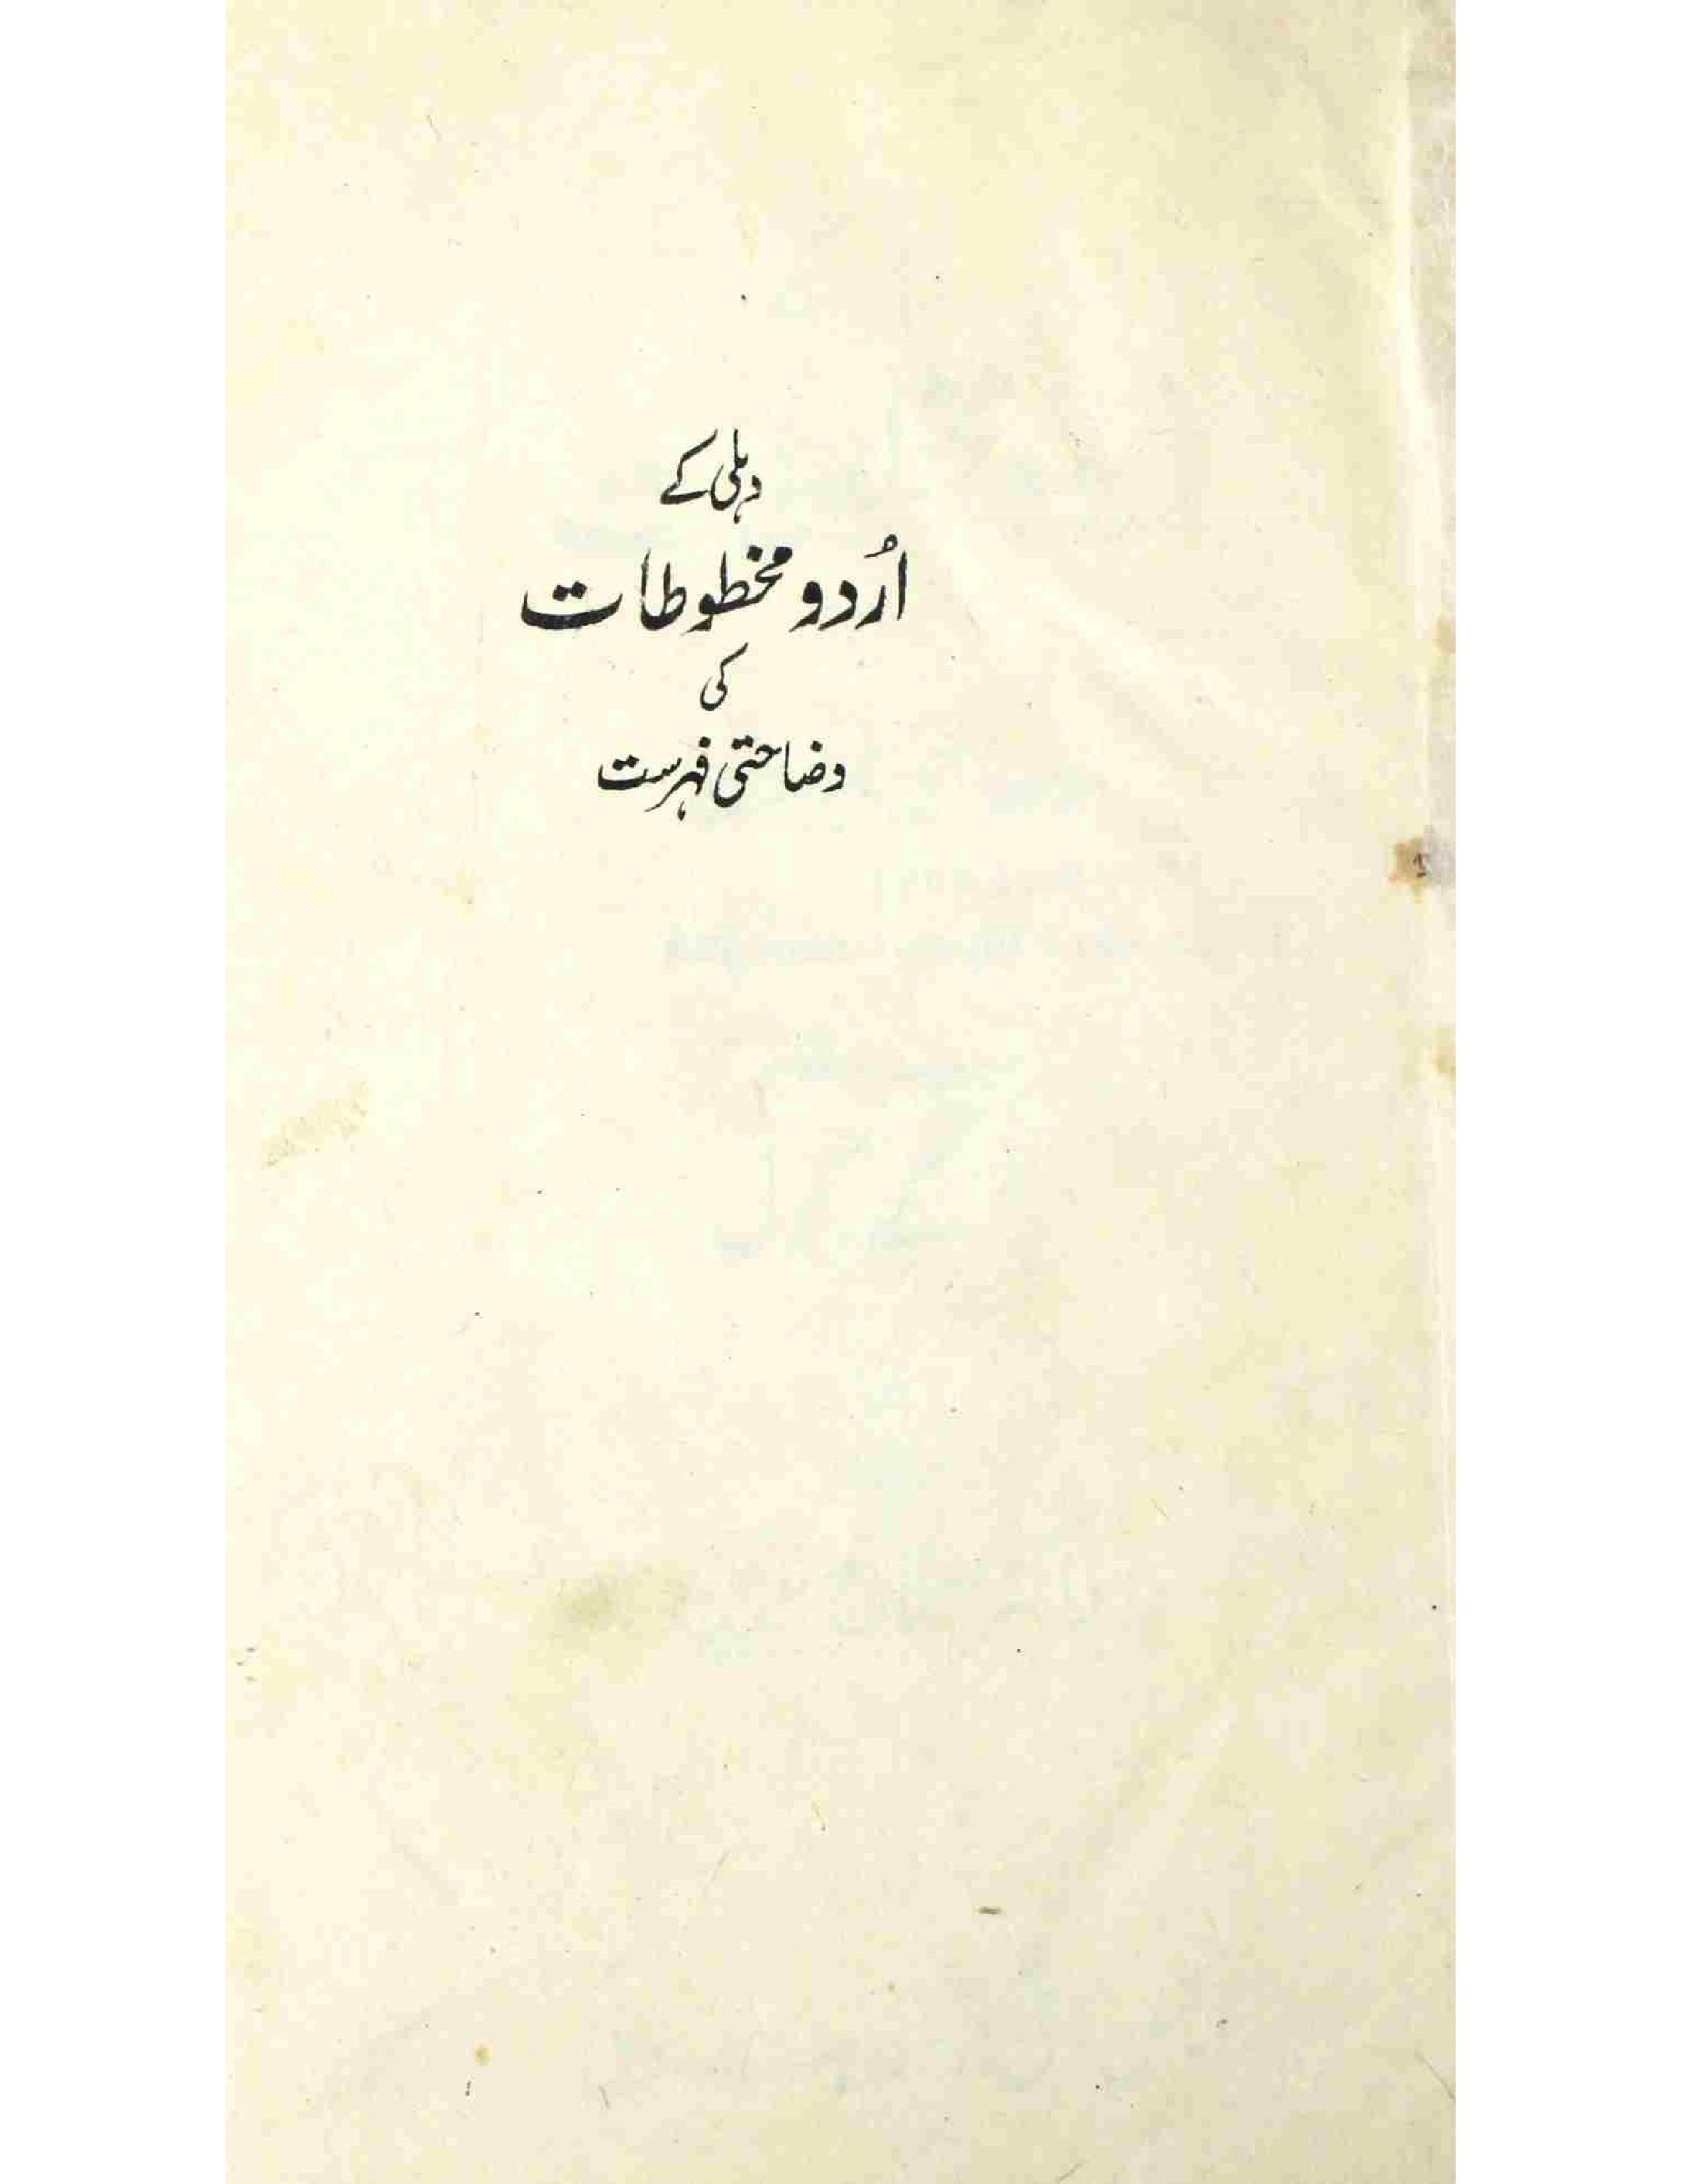 Dehli Ke Urdu Makhtutat ki Wazahati Fehrist